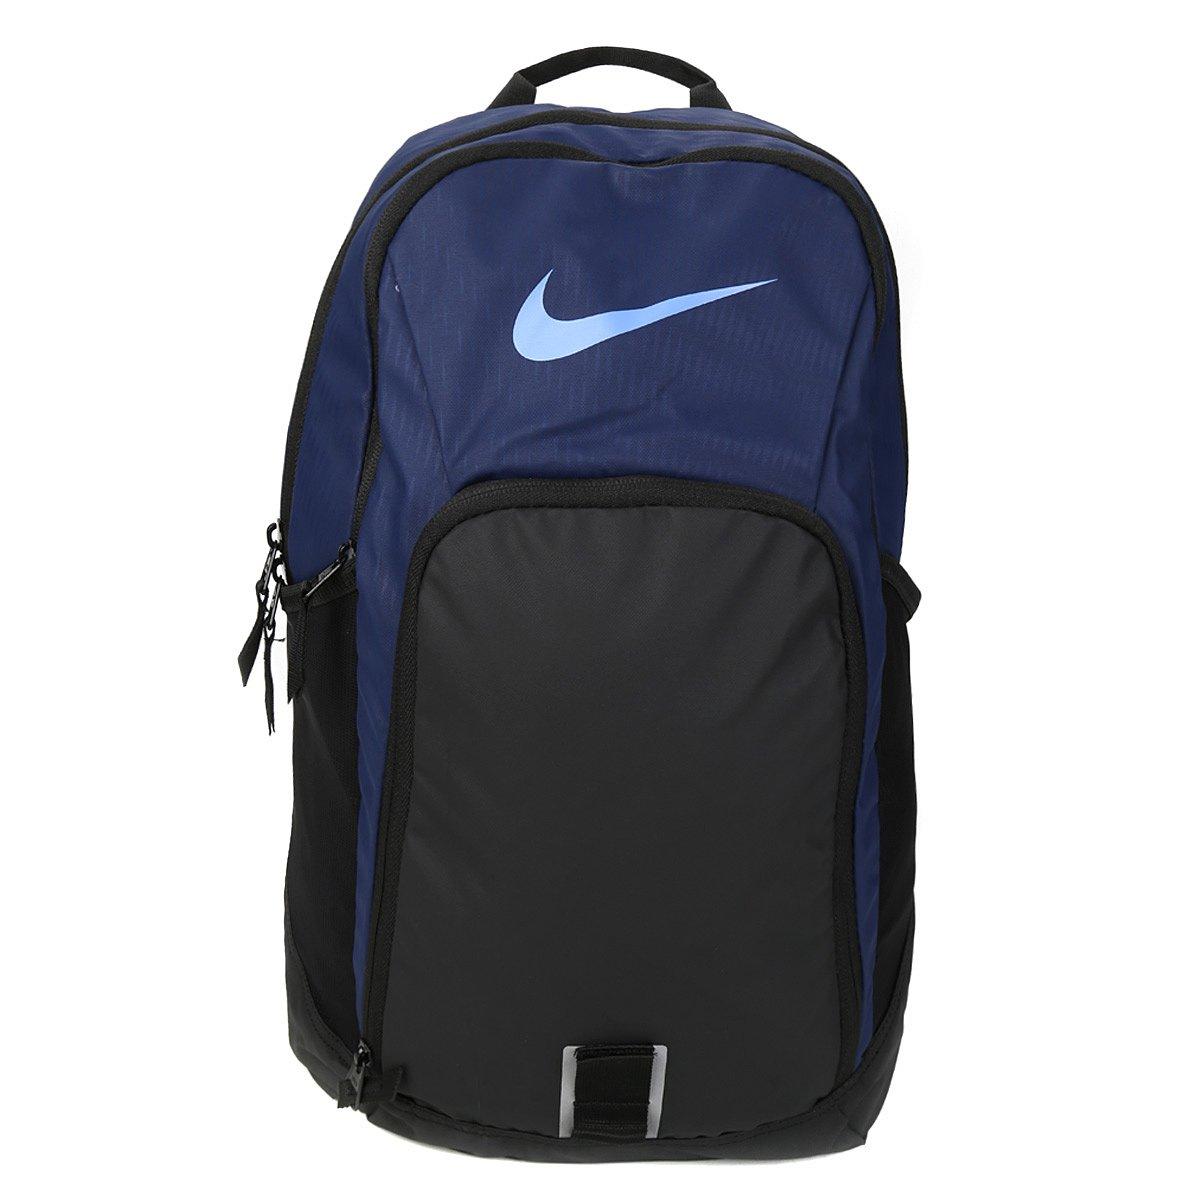 00cc35fdb Mochila Nike Alpha Adapt Rev Masculina | Shop Timão